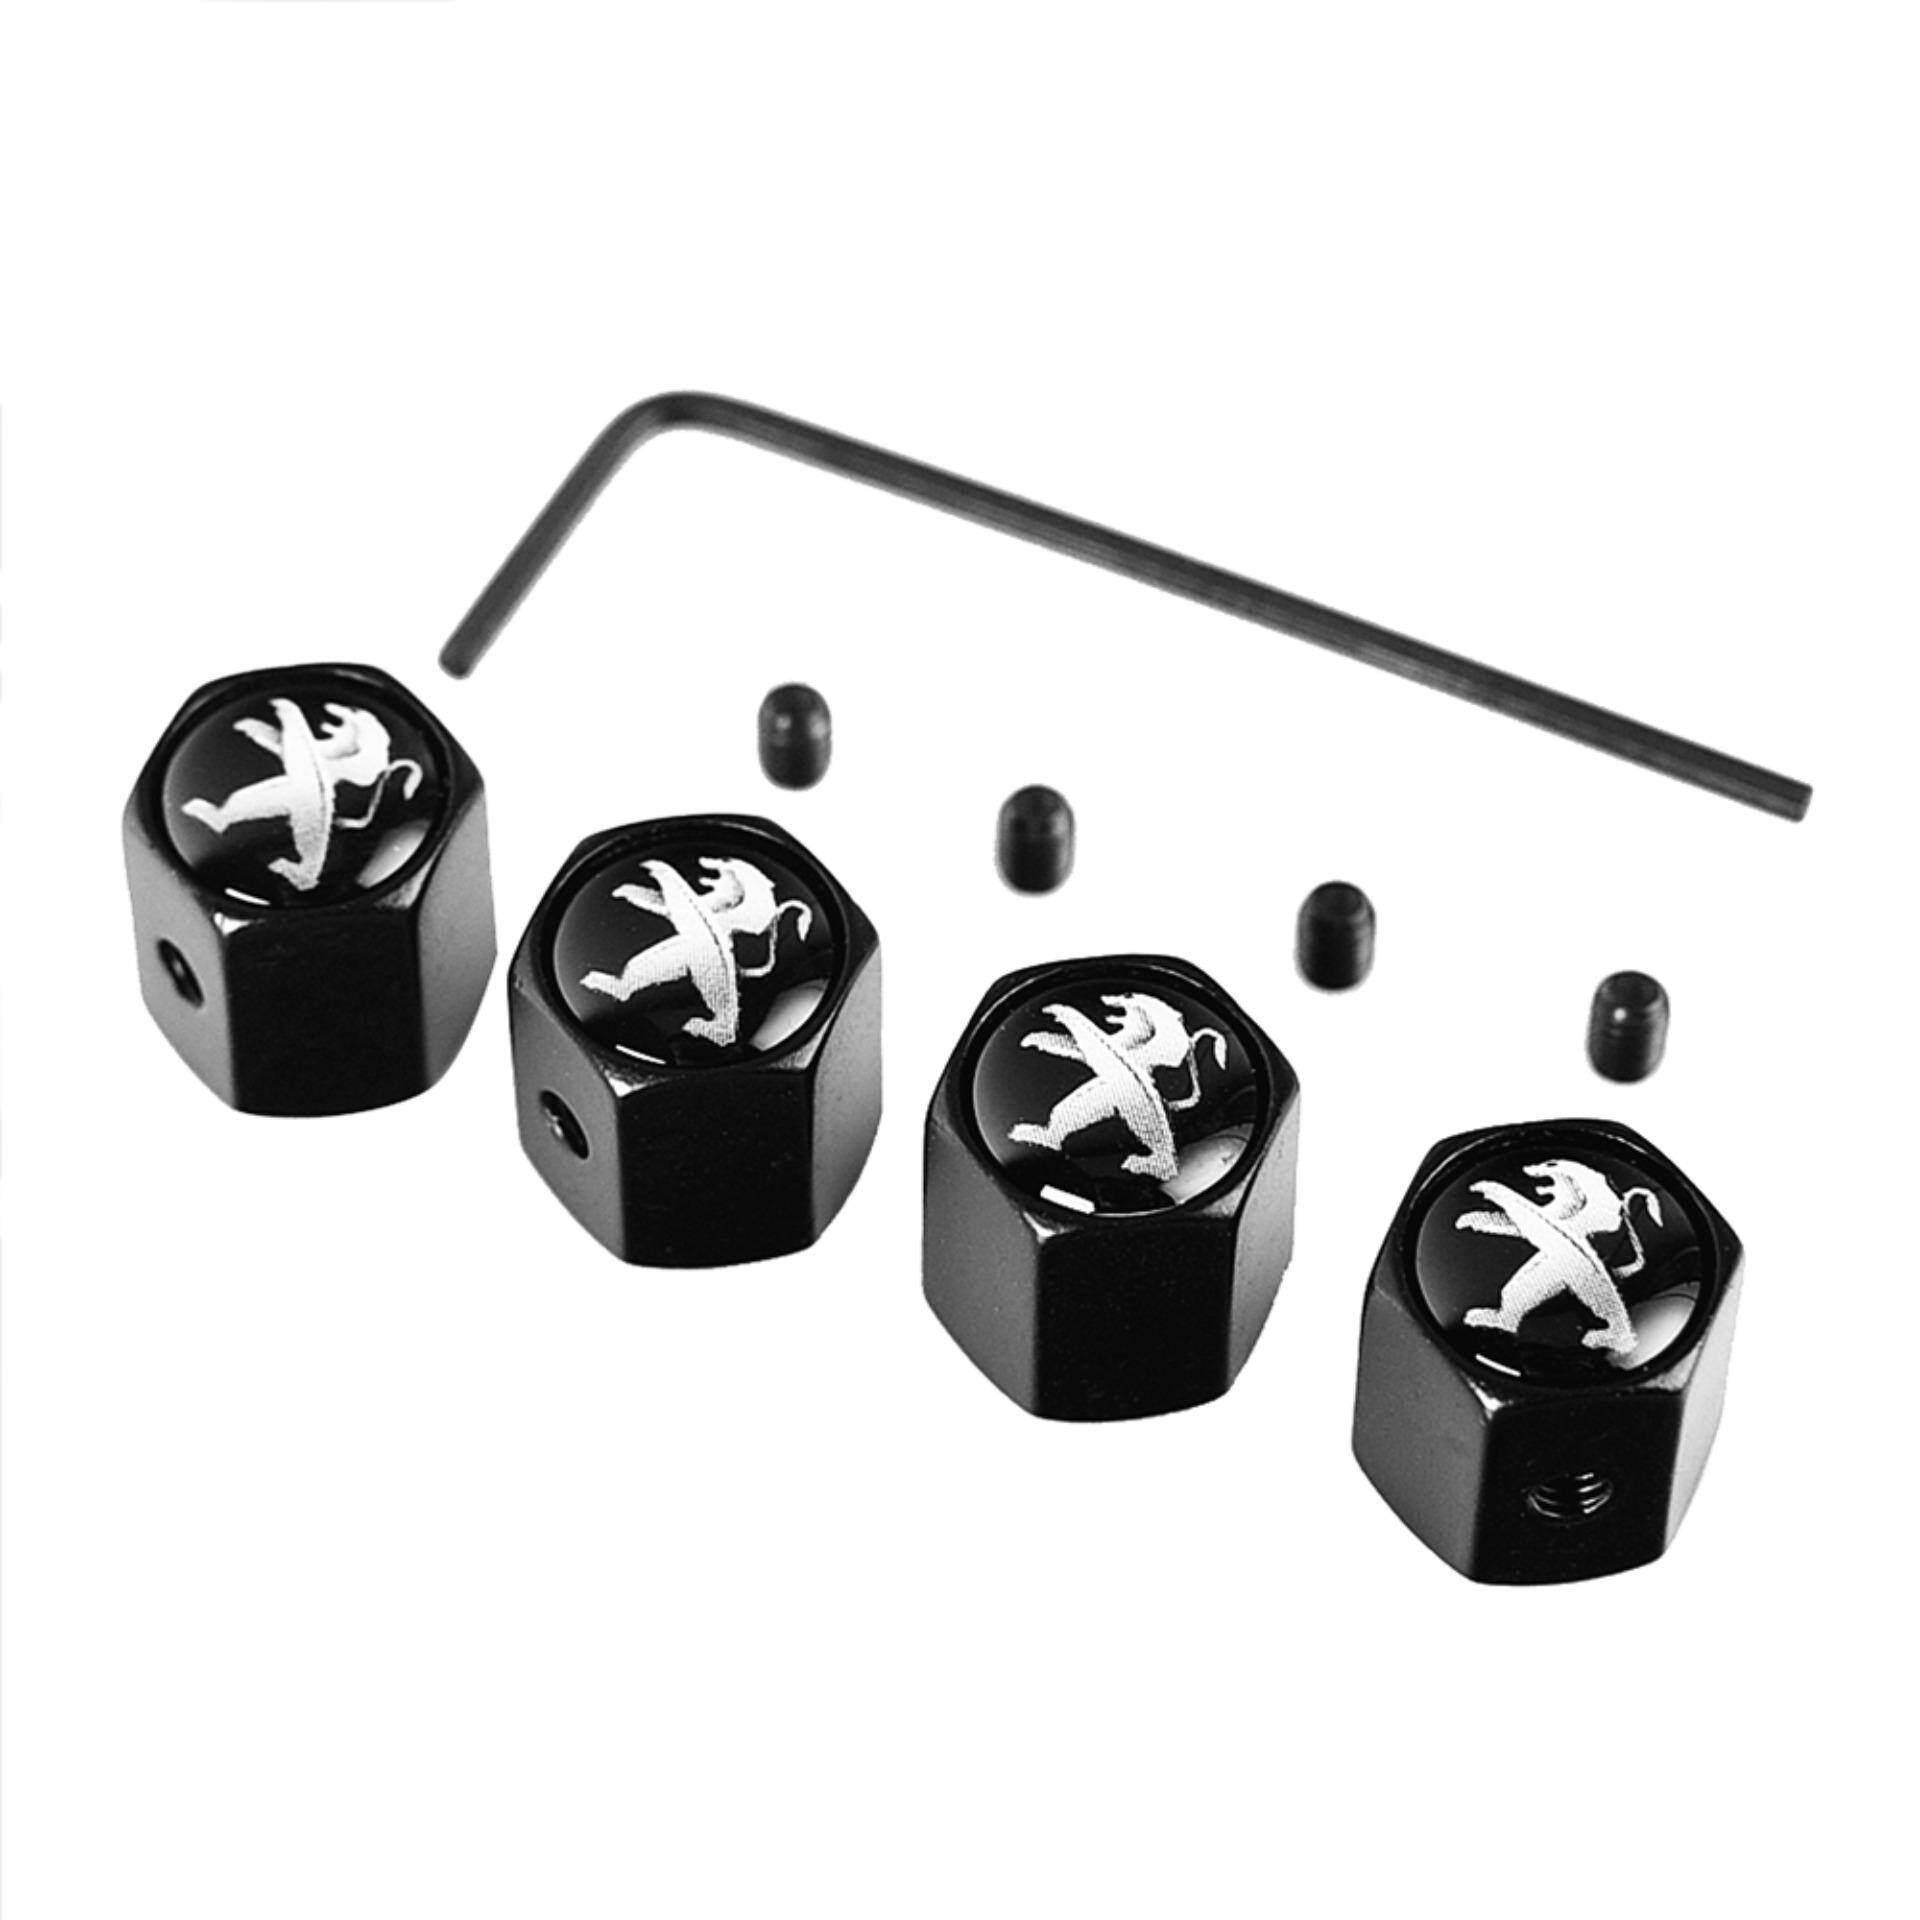 Air Car Wheel Cap 4 Pieces/Pack Tire Valve Caps Anti-theft Car-